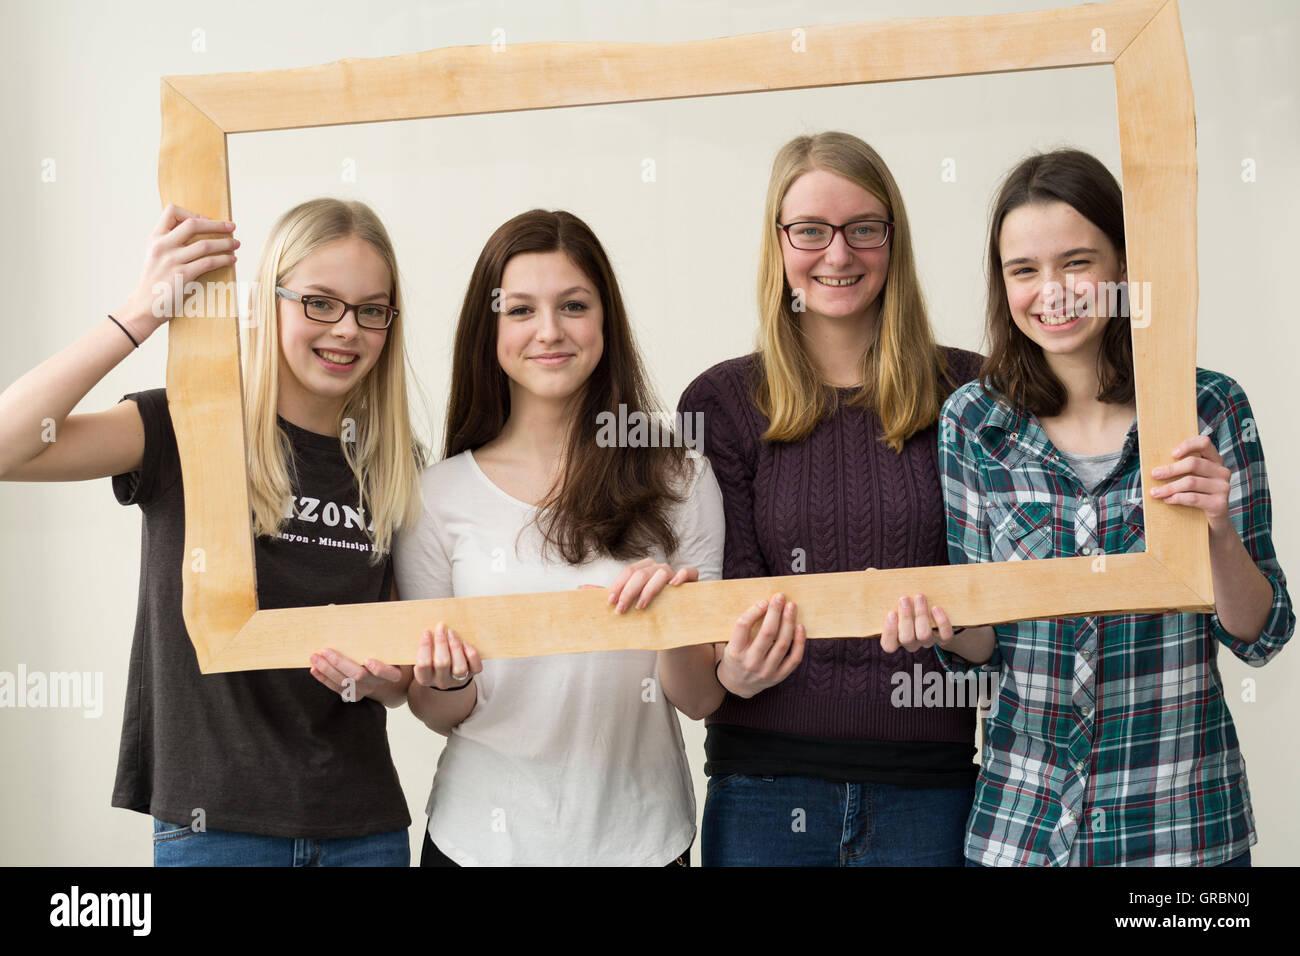 Smiling Girl Quartet With Photo Frames Stock Photo